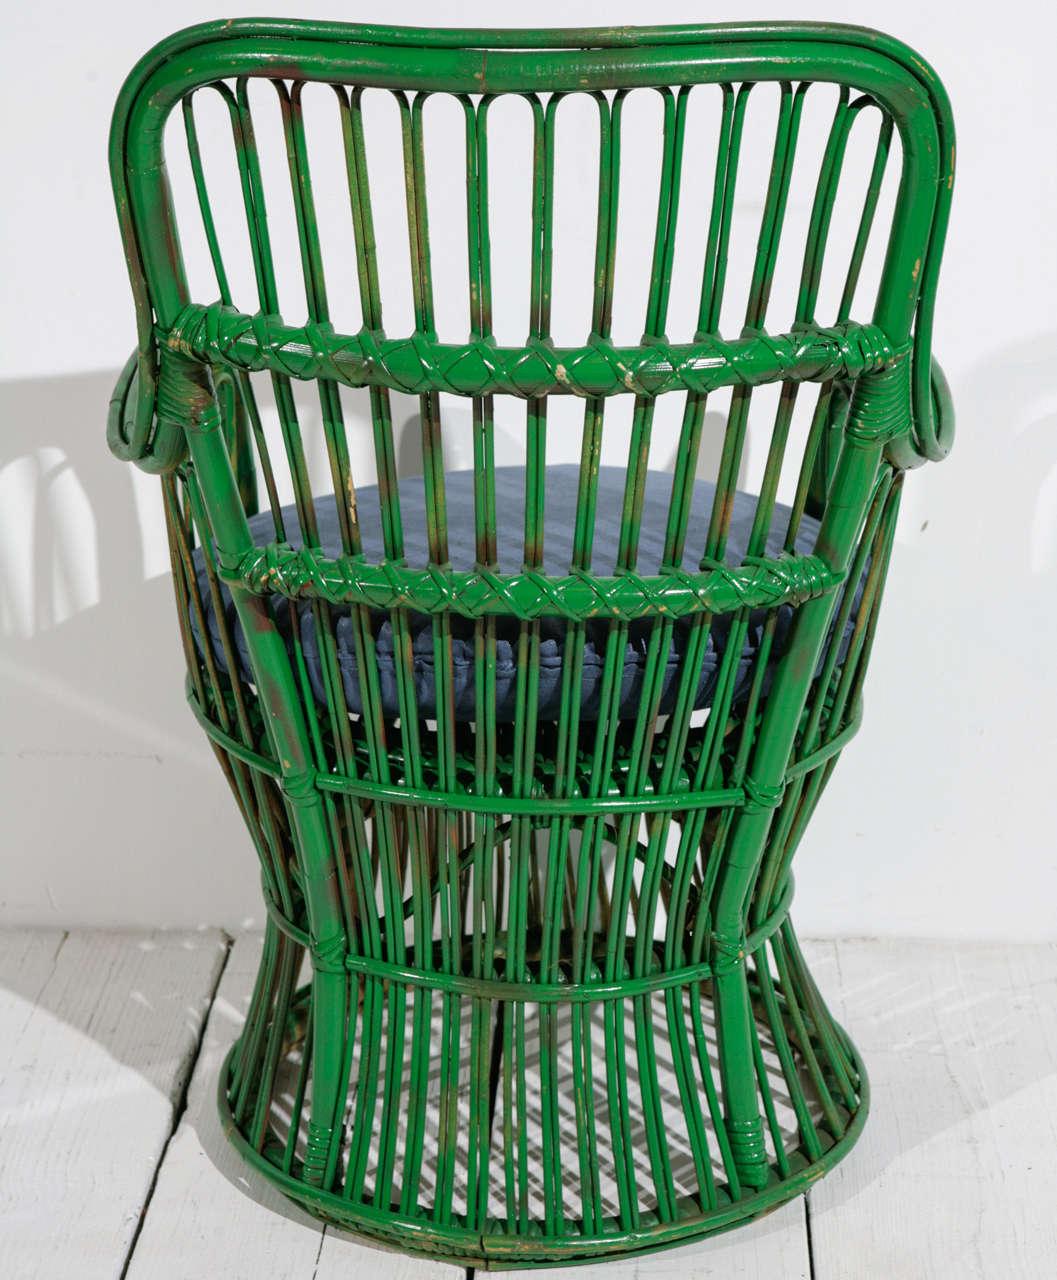 Green Wicker Armchair in the style of Gio Ponti and Lio Carminati | Small 1